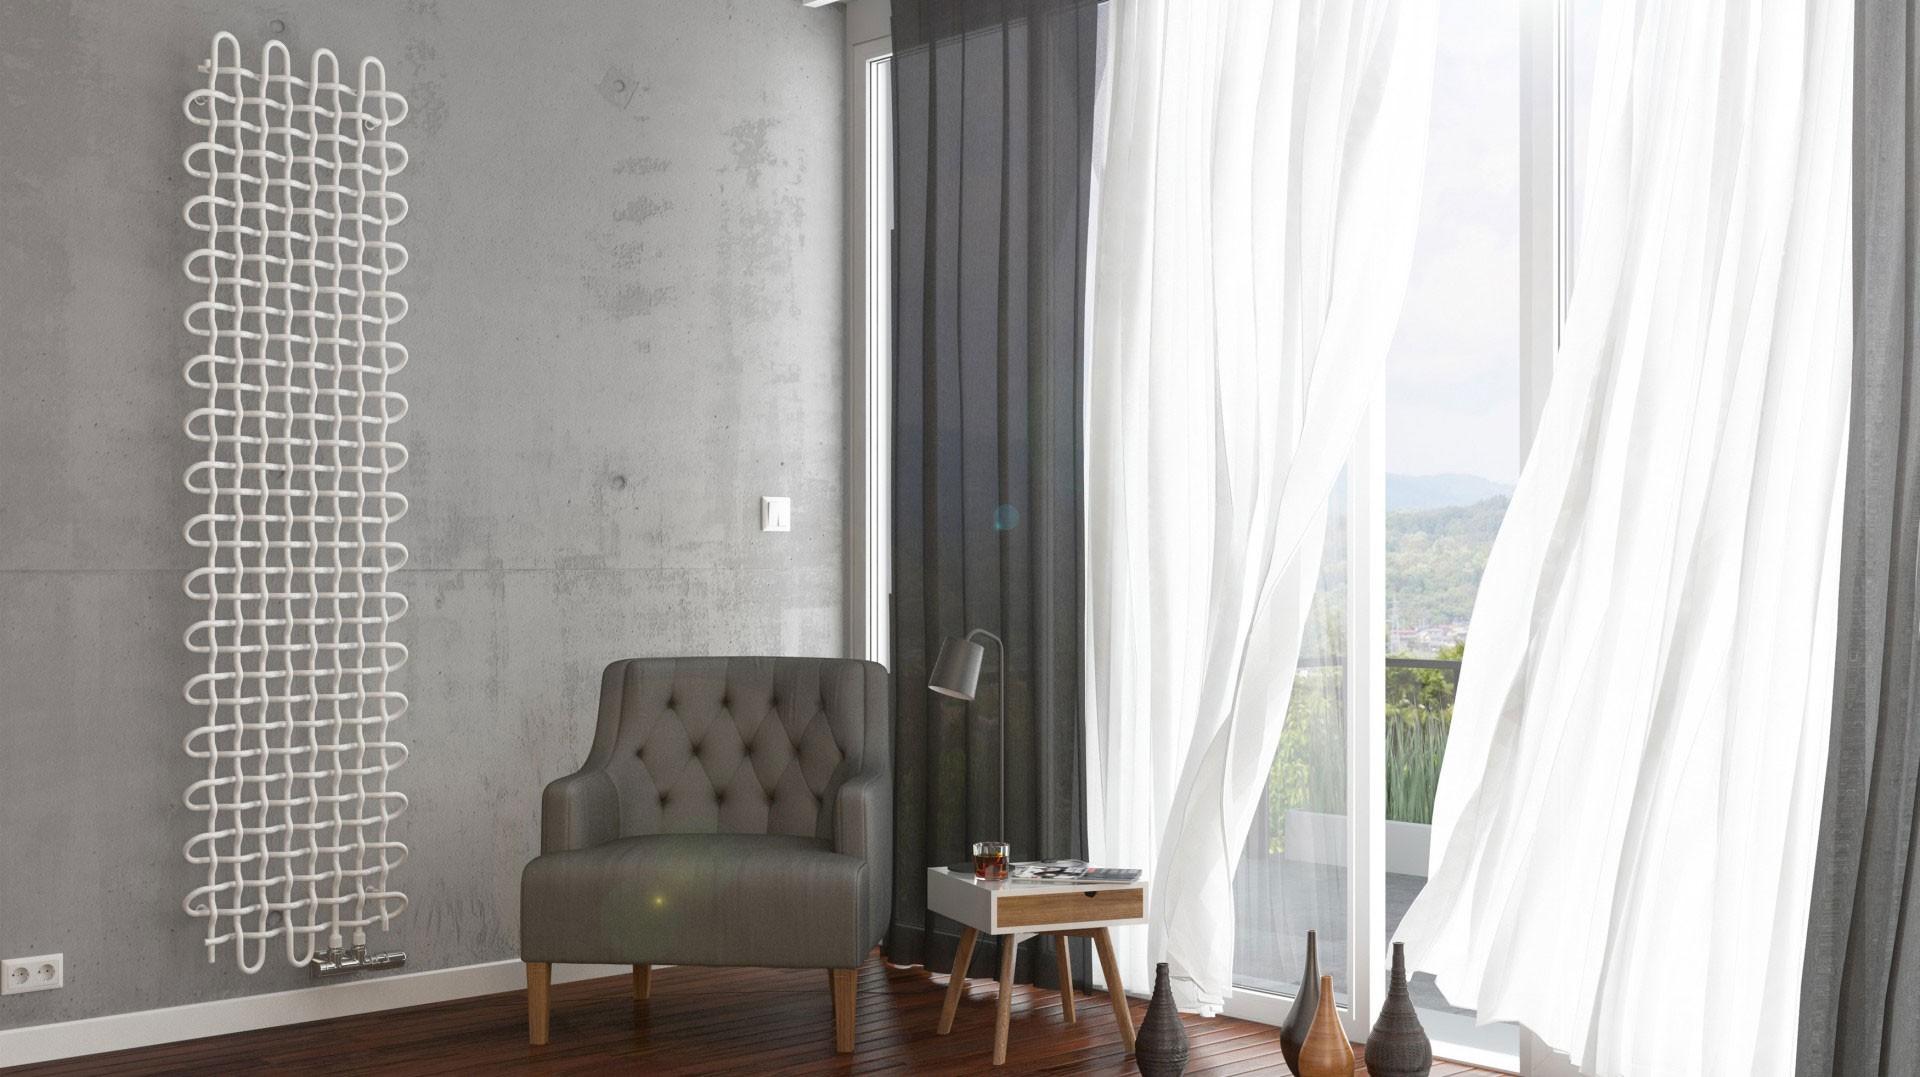 Design Gitterheizkörper, Wohnraumheizkörper Terma PLC V vertikal